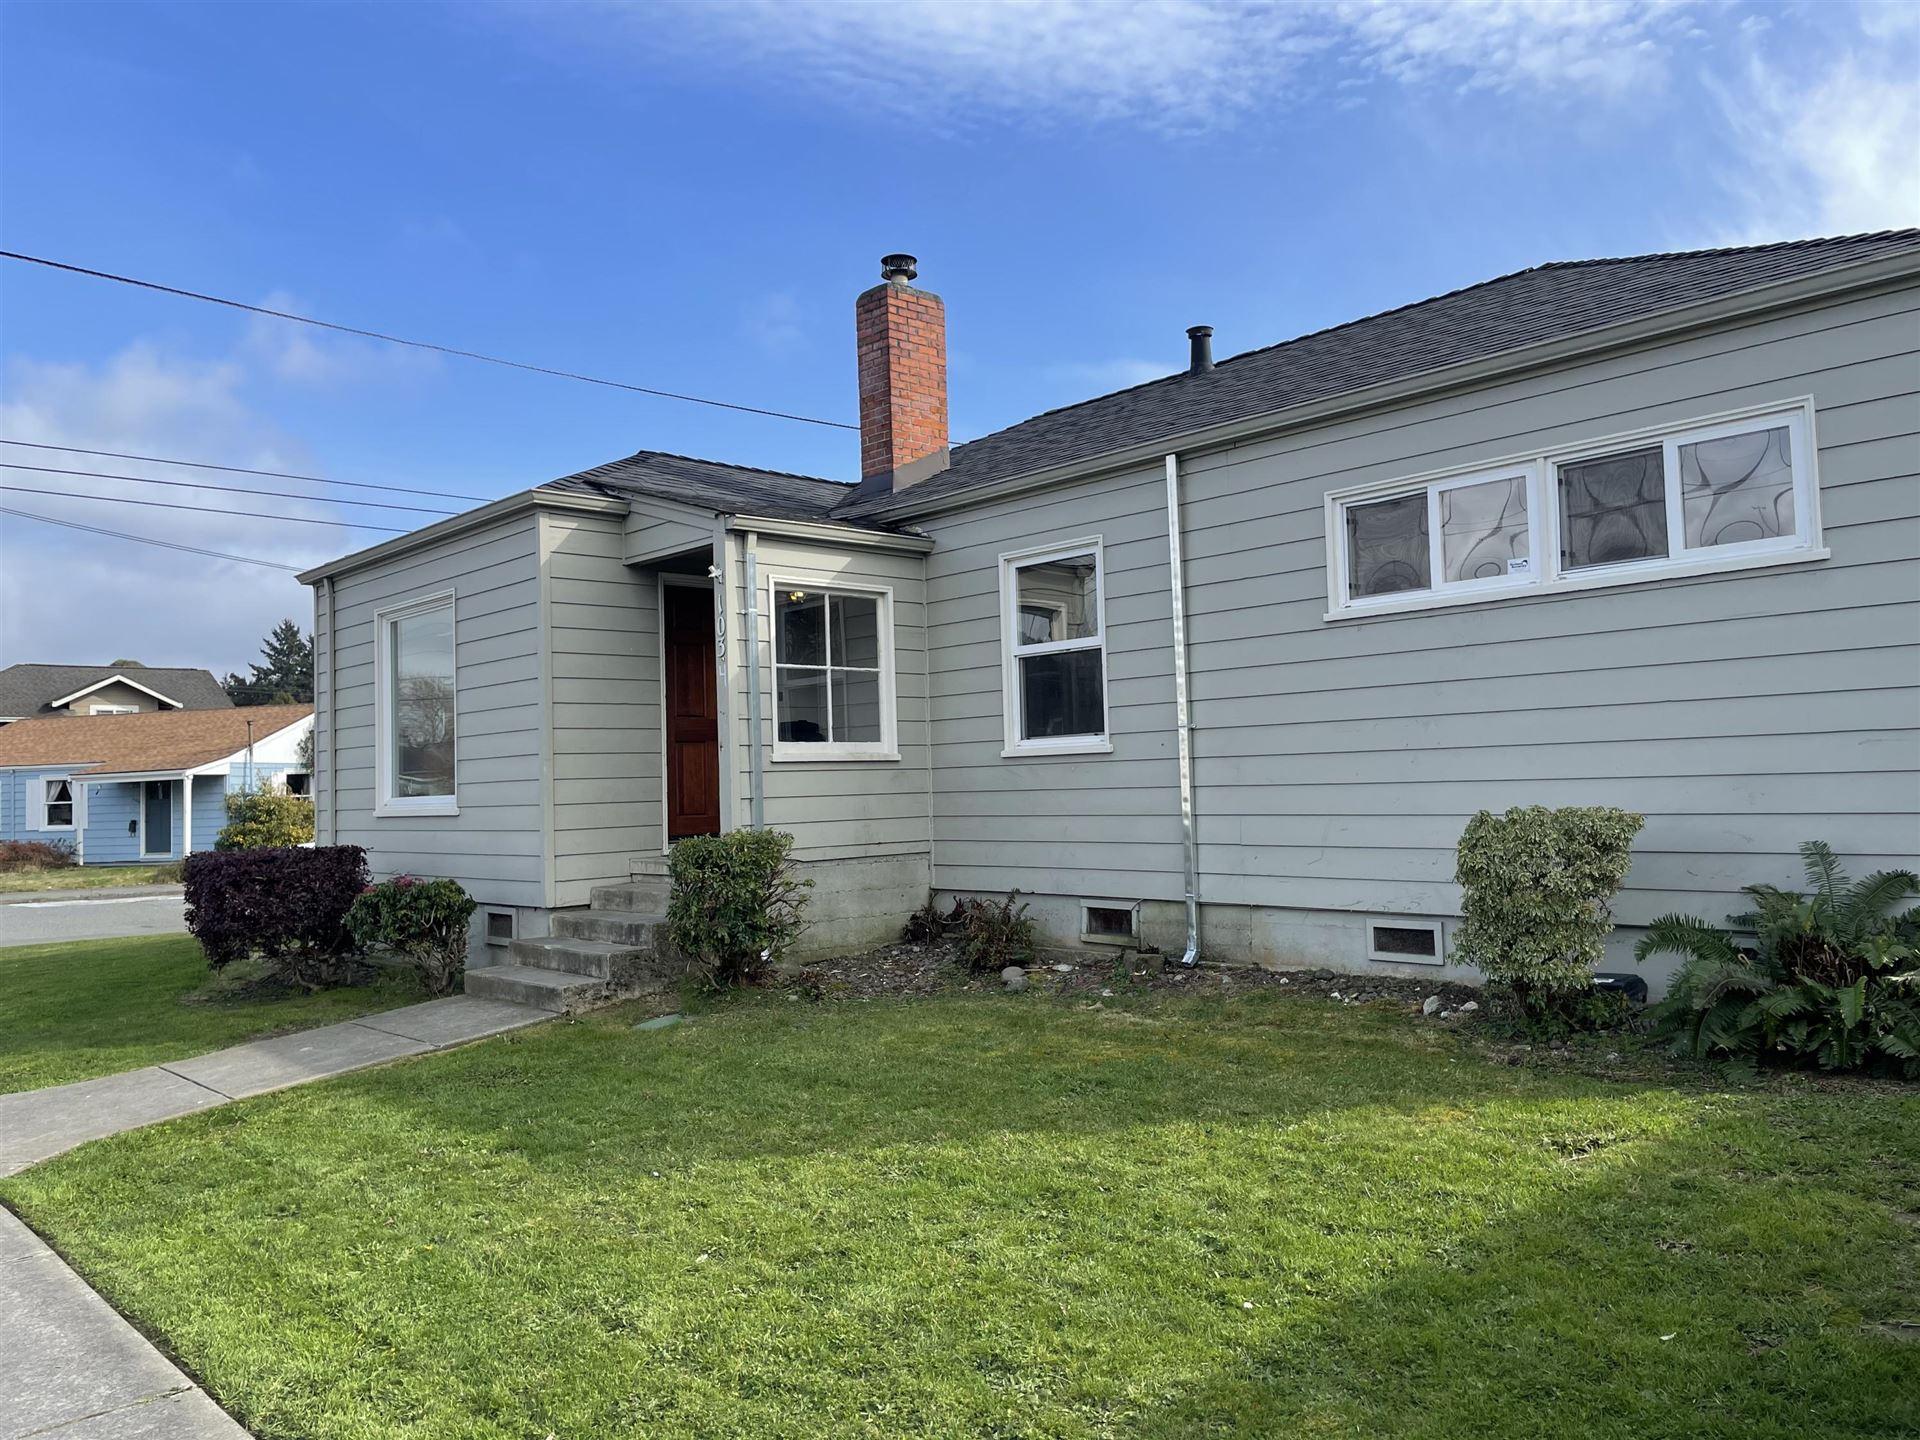 1034 Harris Street, Eureka, CA 95503 - MLS#: 258461